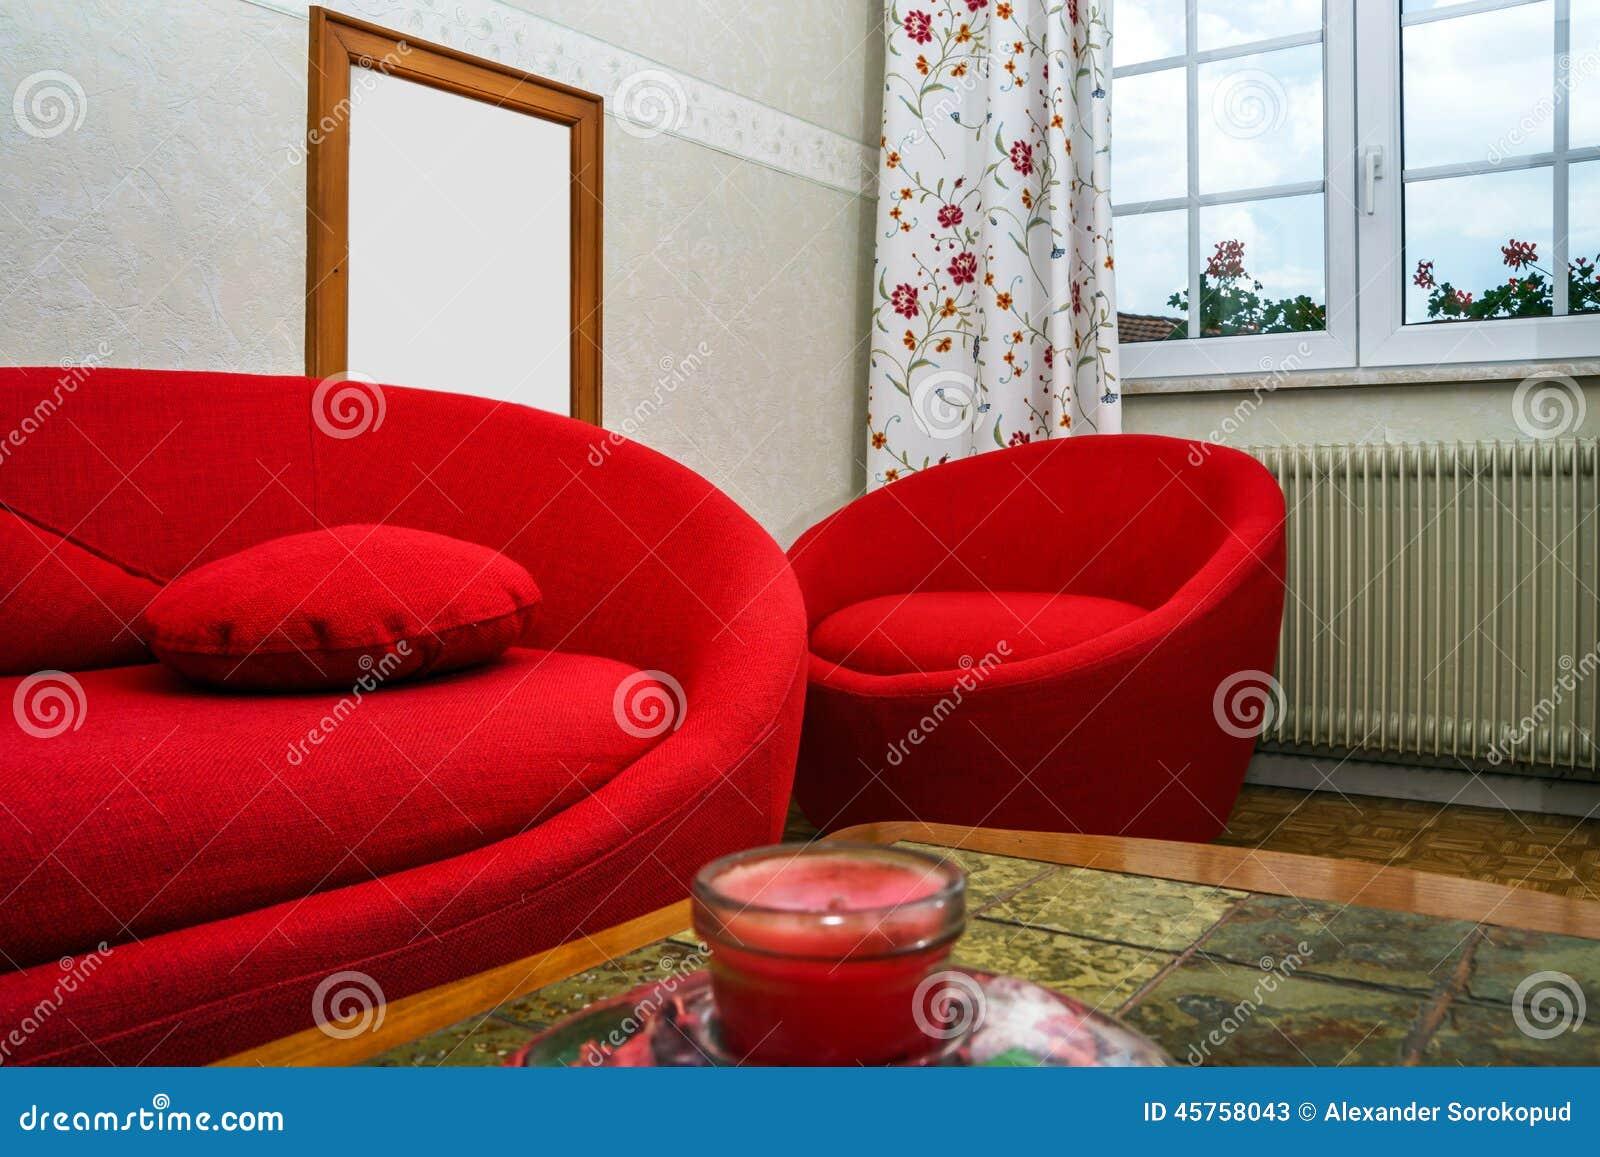 rotes rundes sofa stockfoto bild 45758043. Black Bedroom Furniture Sets. Home Design Ideas